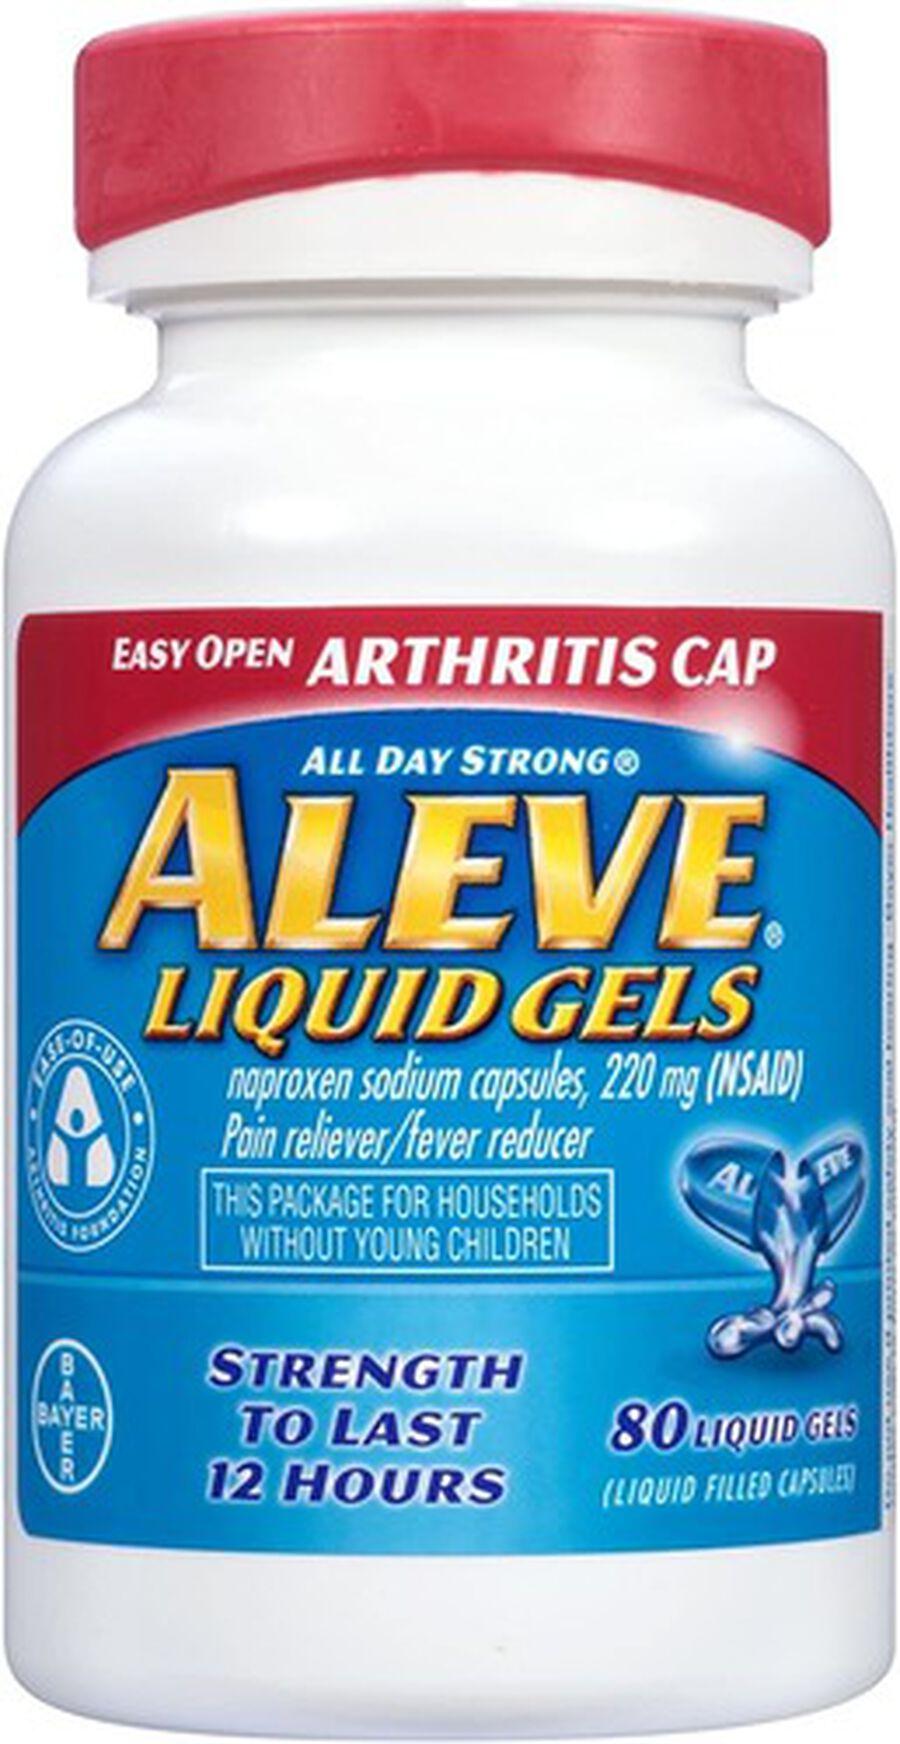 Aleve Arthritis Liquid Gels, Easy Open Cap, 80ct, , large image number 4